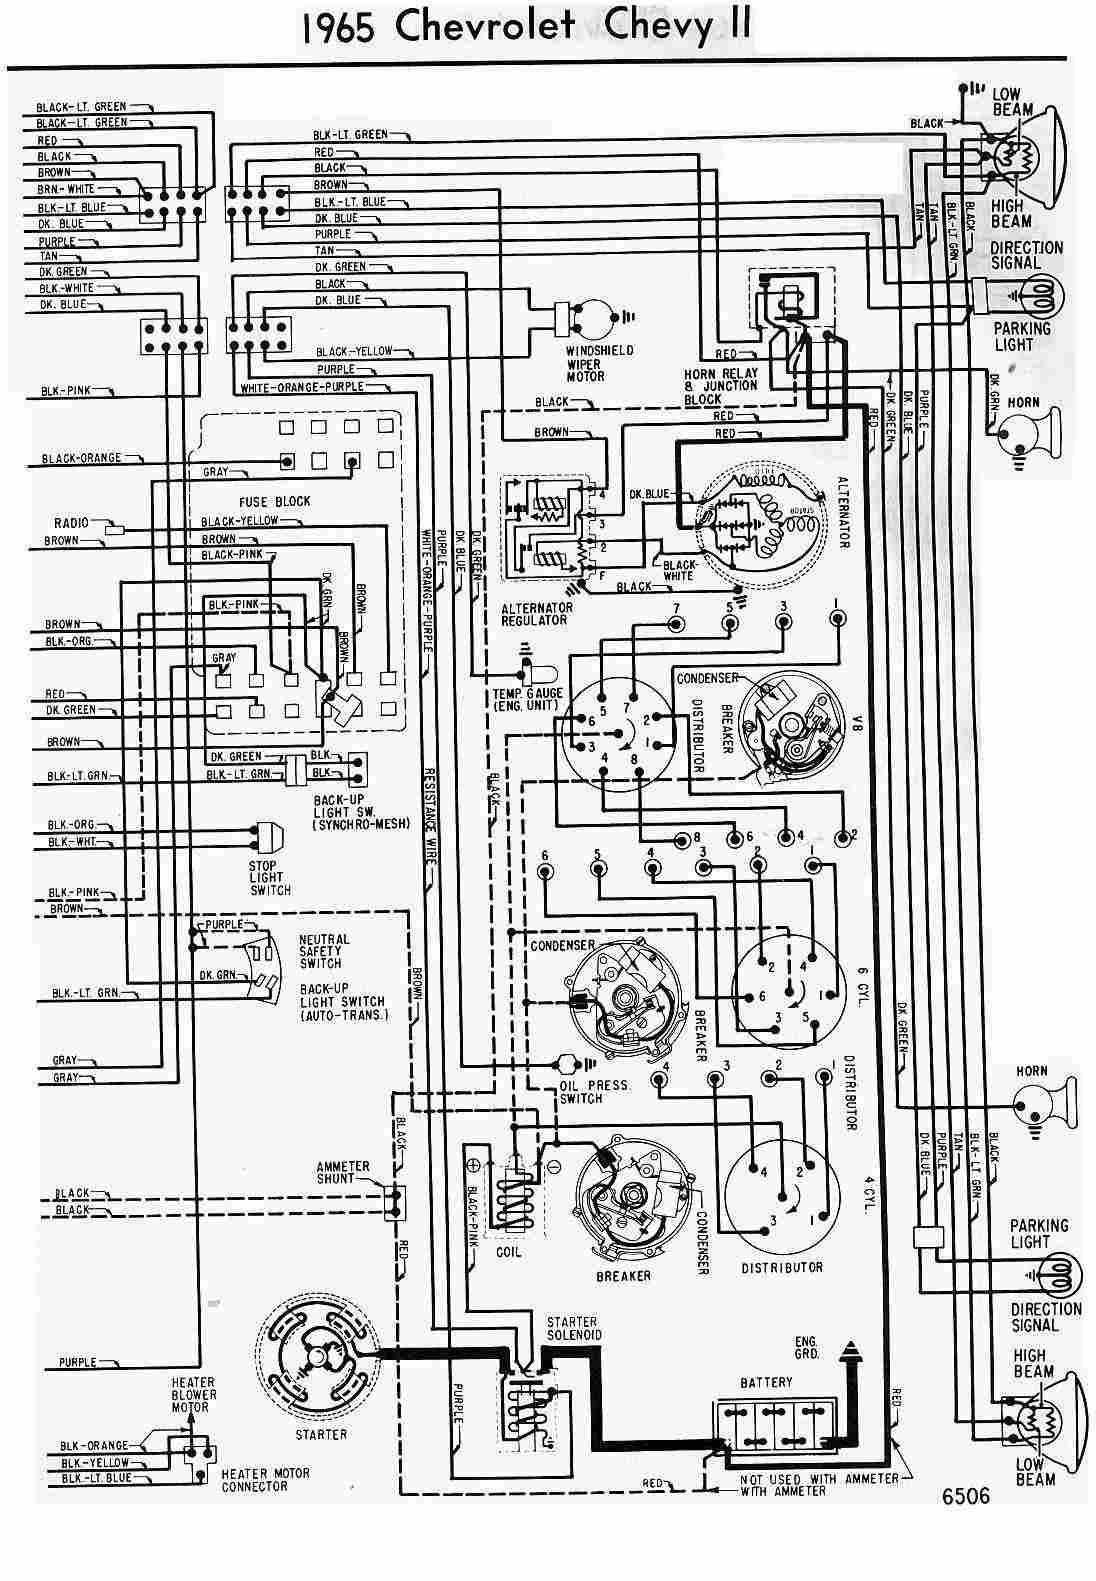 1972 cadillac deville wiring diagram wiring schematic wiring diagram buick grand national 57 cadillac eldorado [ 1096 x 1581 Pixel ]